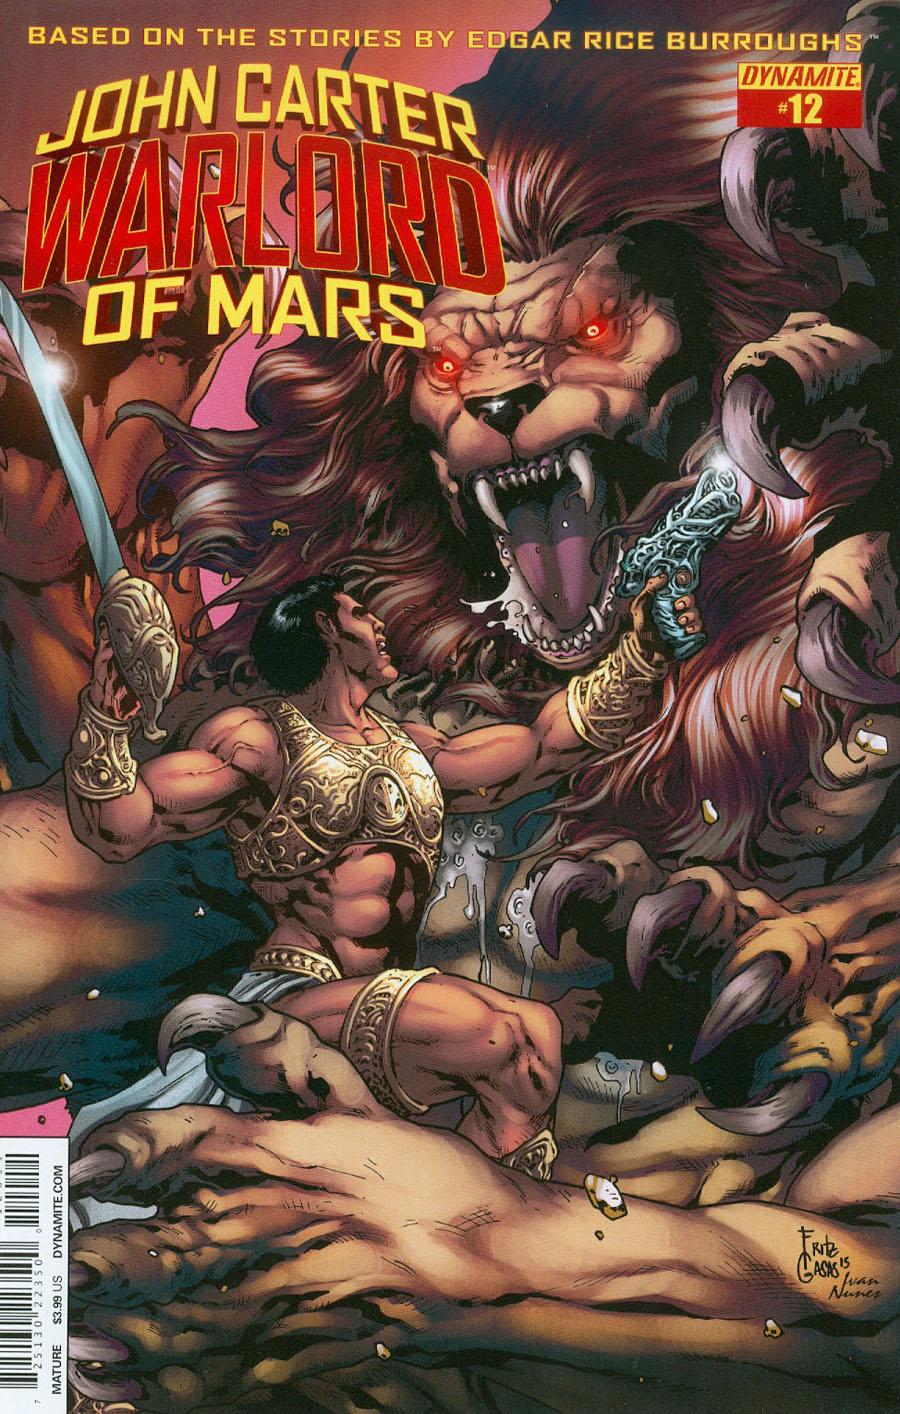 John Carter Warlord Of Mars Vol 2 #12 Cover A Regular Bart Sears Cover